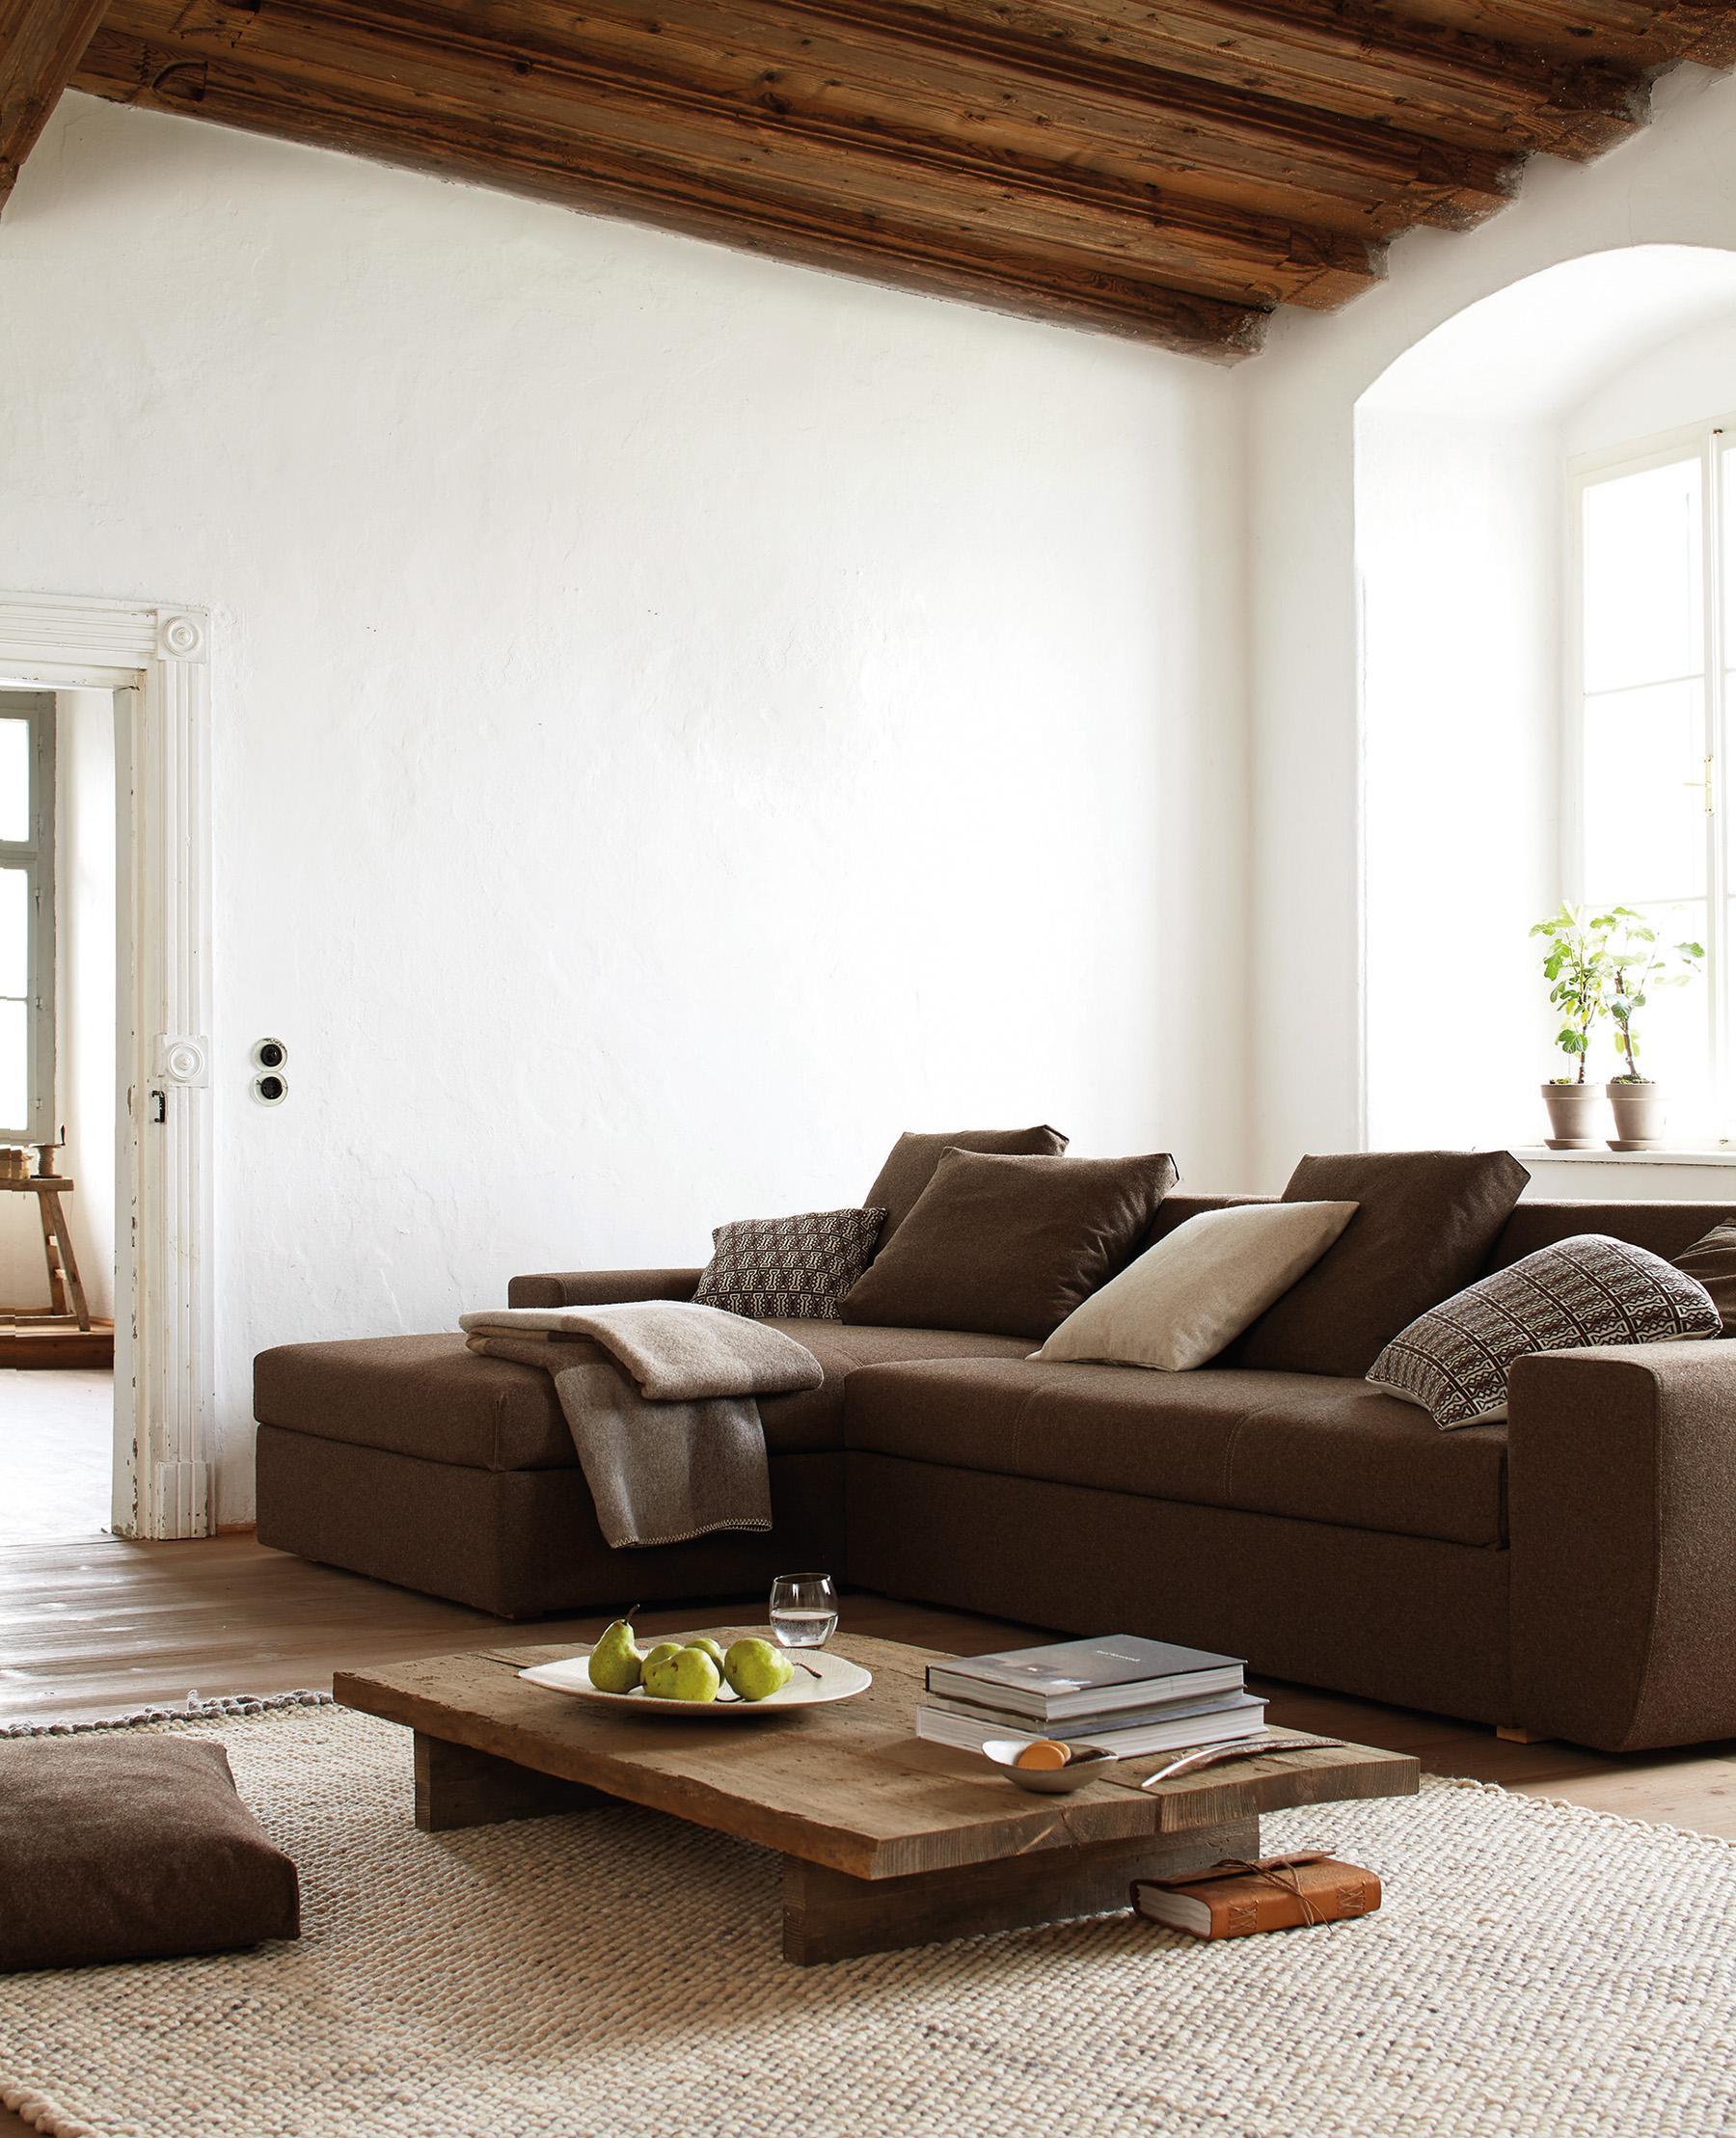 Couch Ideen Braunes Ledersofa Bilder And Ideen Couch